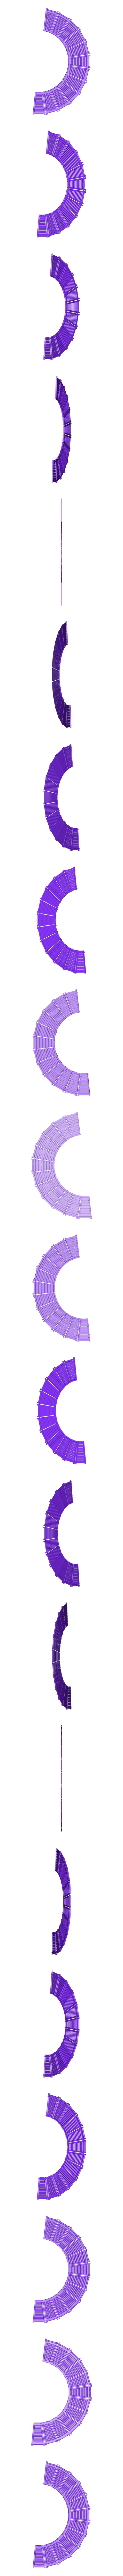 180_plat1.stl Download free STL file The Crannog • 3D printable template, Earsling